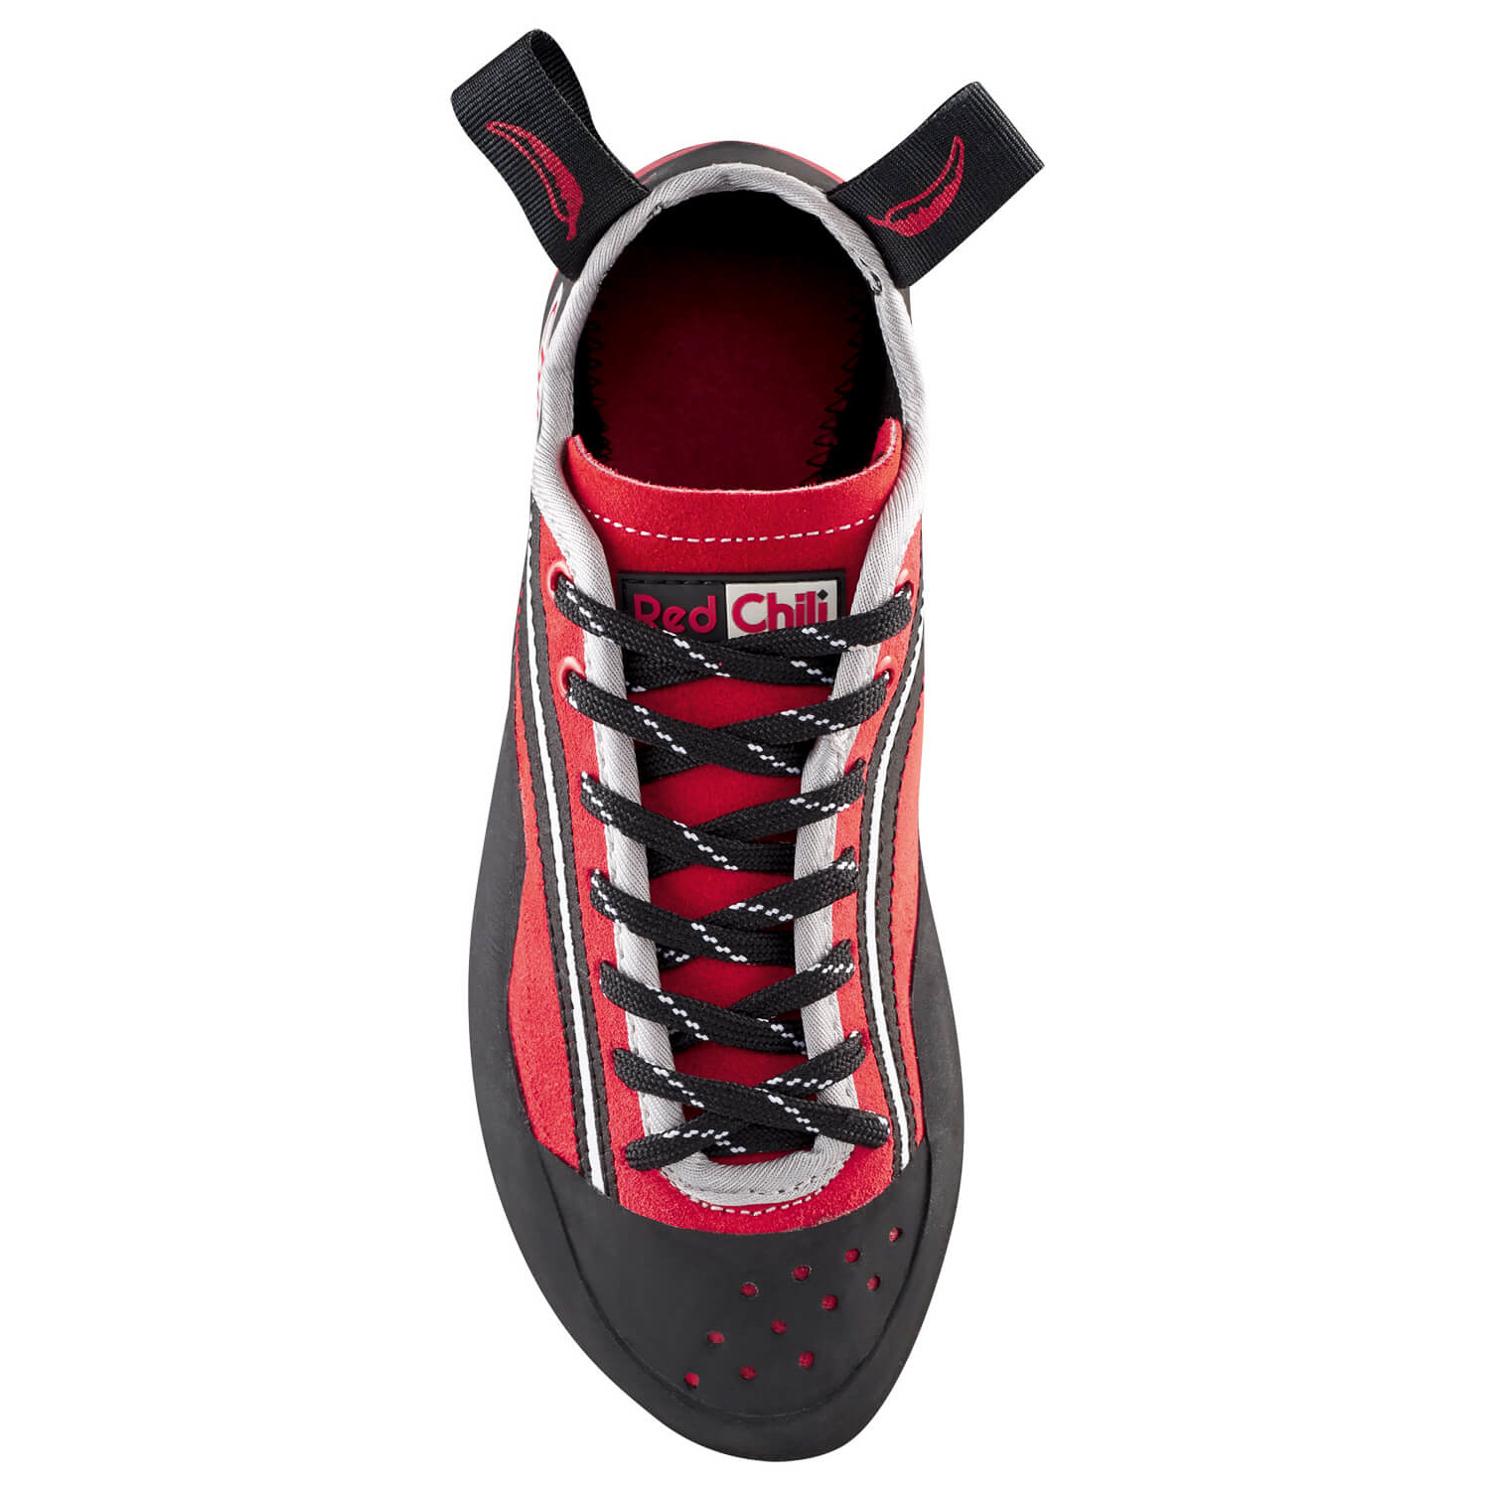 Red Chili Sausalito Climbing Shoes